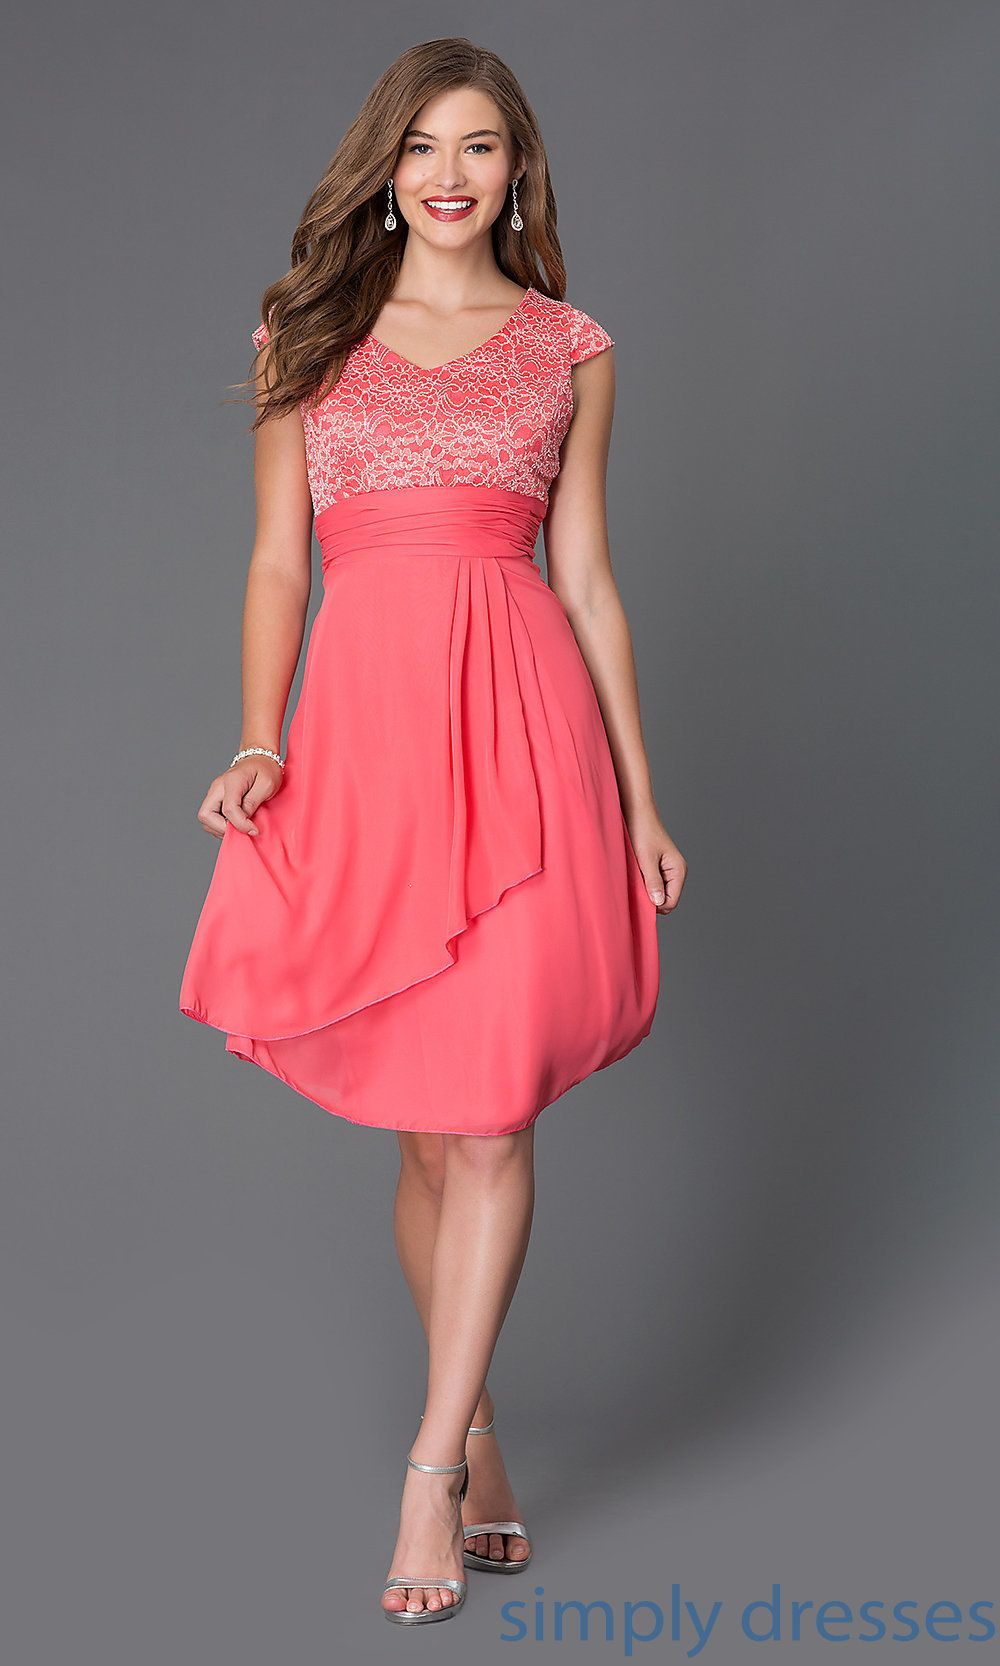 Kneelength capsleeve sally fashion dress dress pinterest